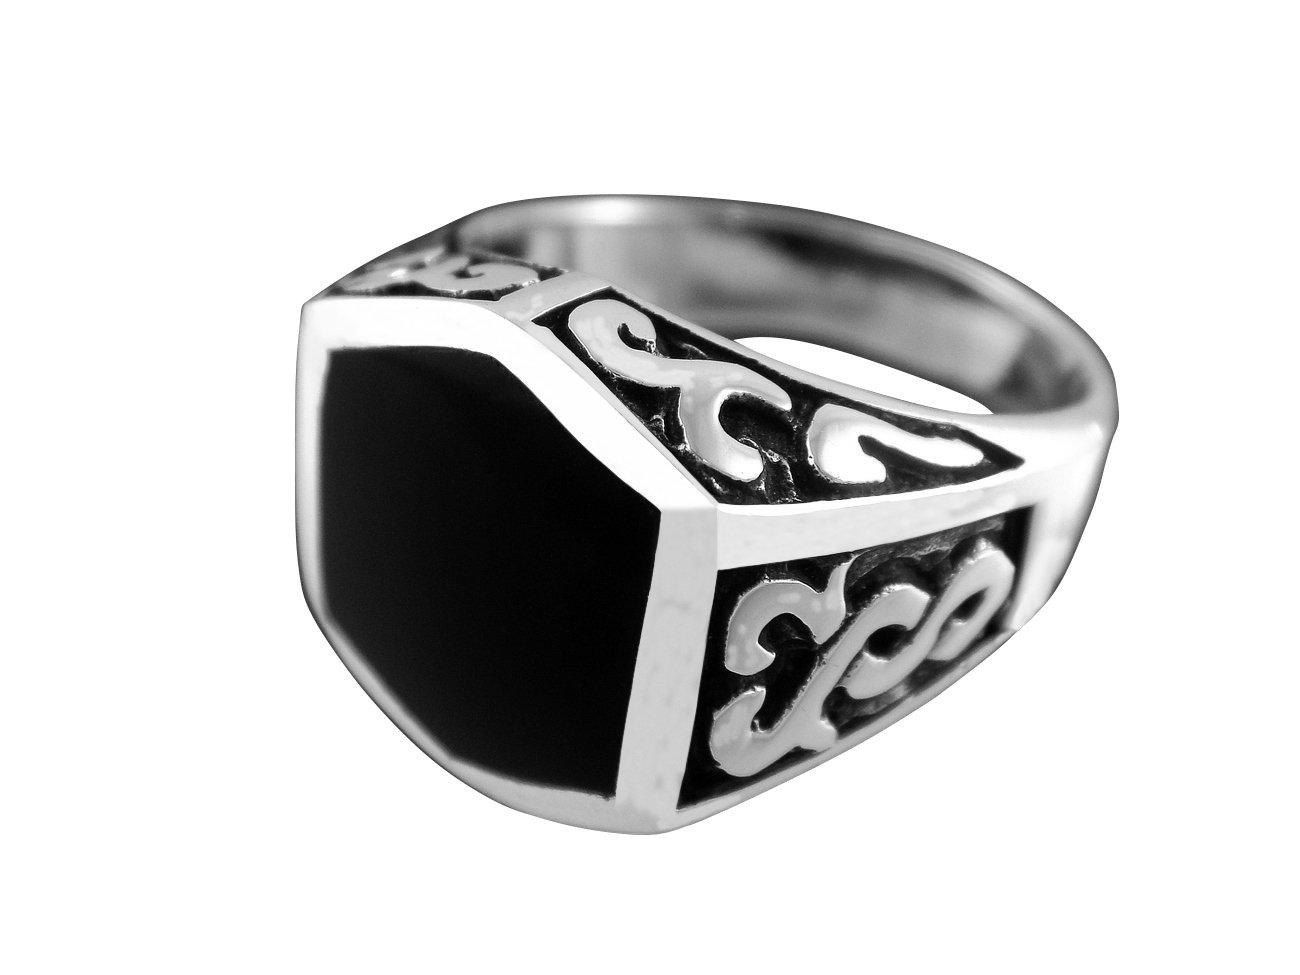 925 Sterling Silver Men's Black Onyx Celtic Irish Oxidized Sides Ring 12g